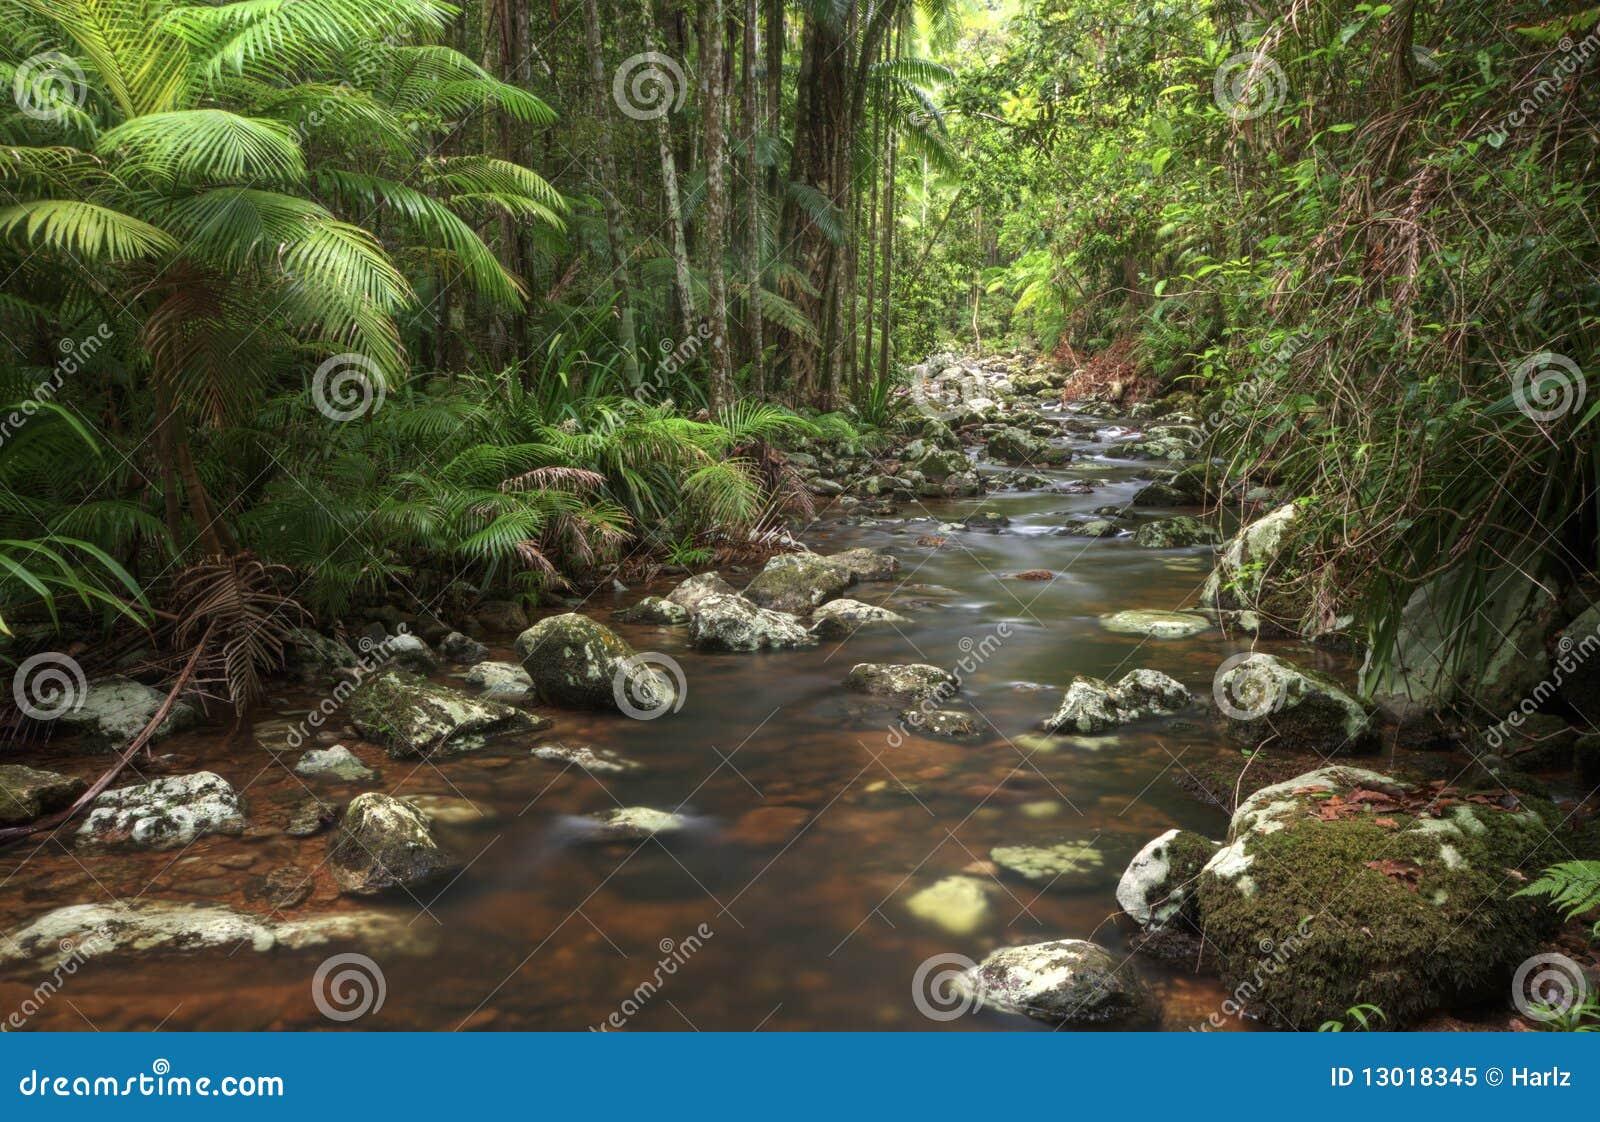 Rocky stream through rainforest and palm trees